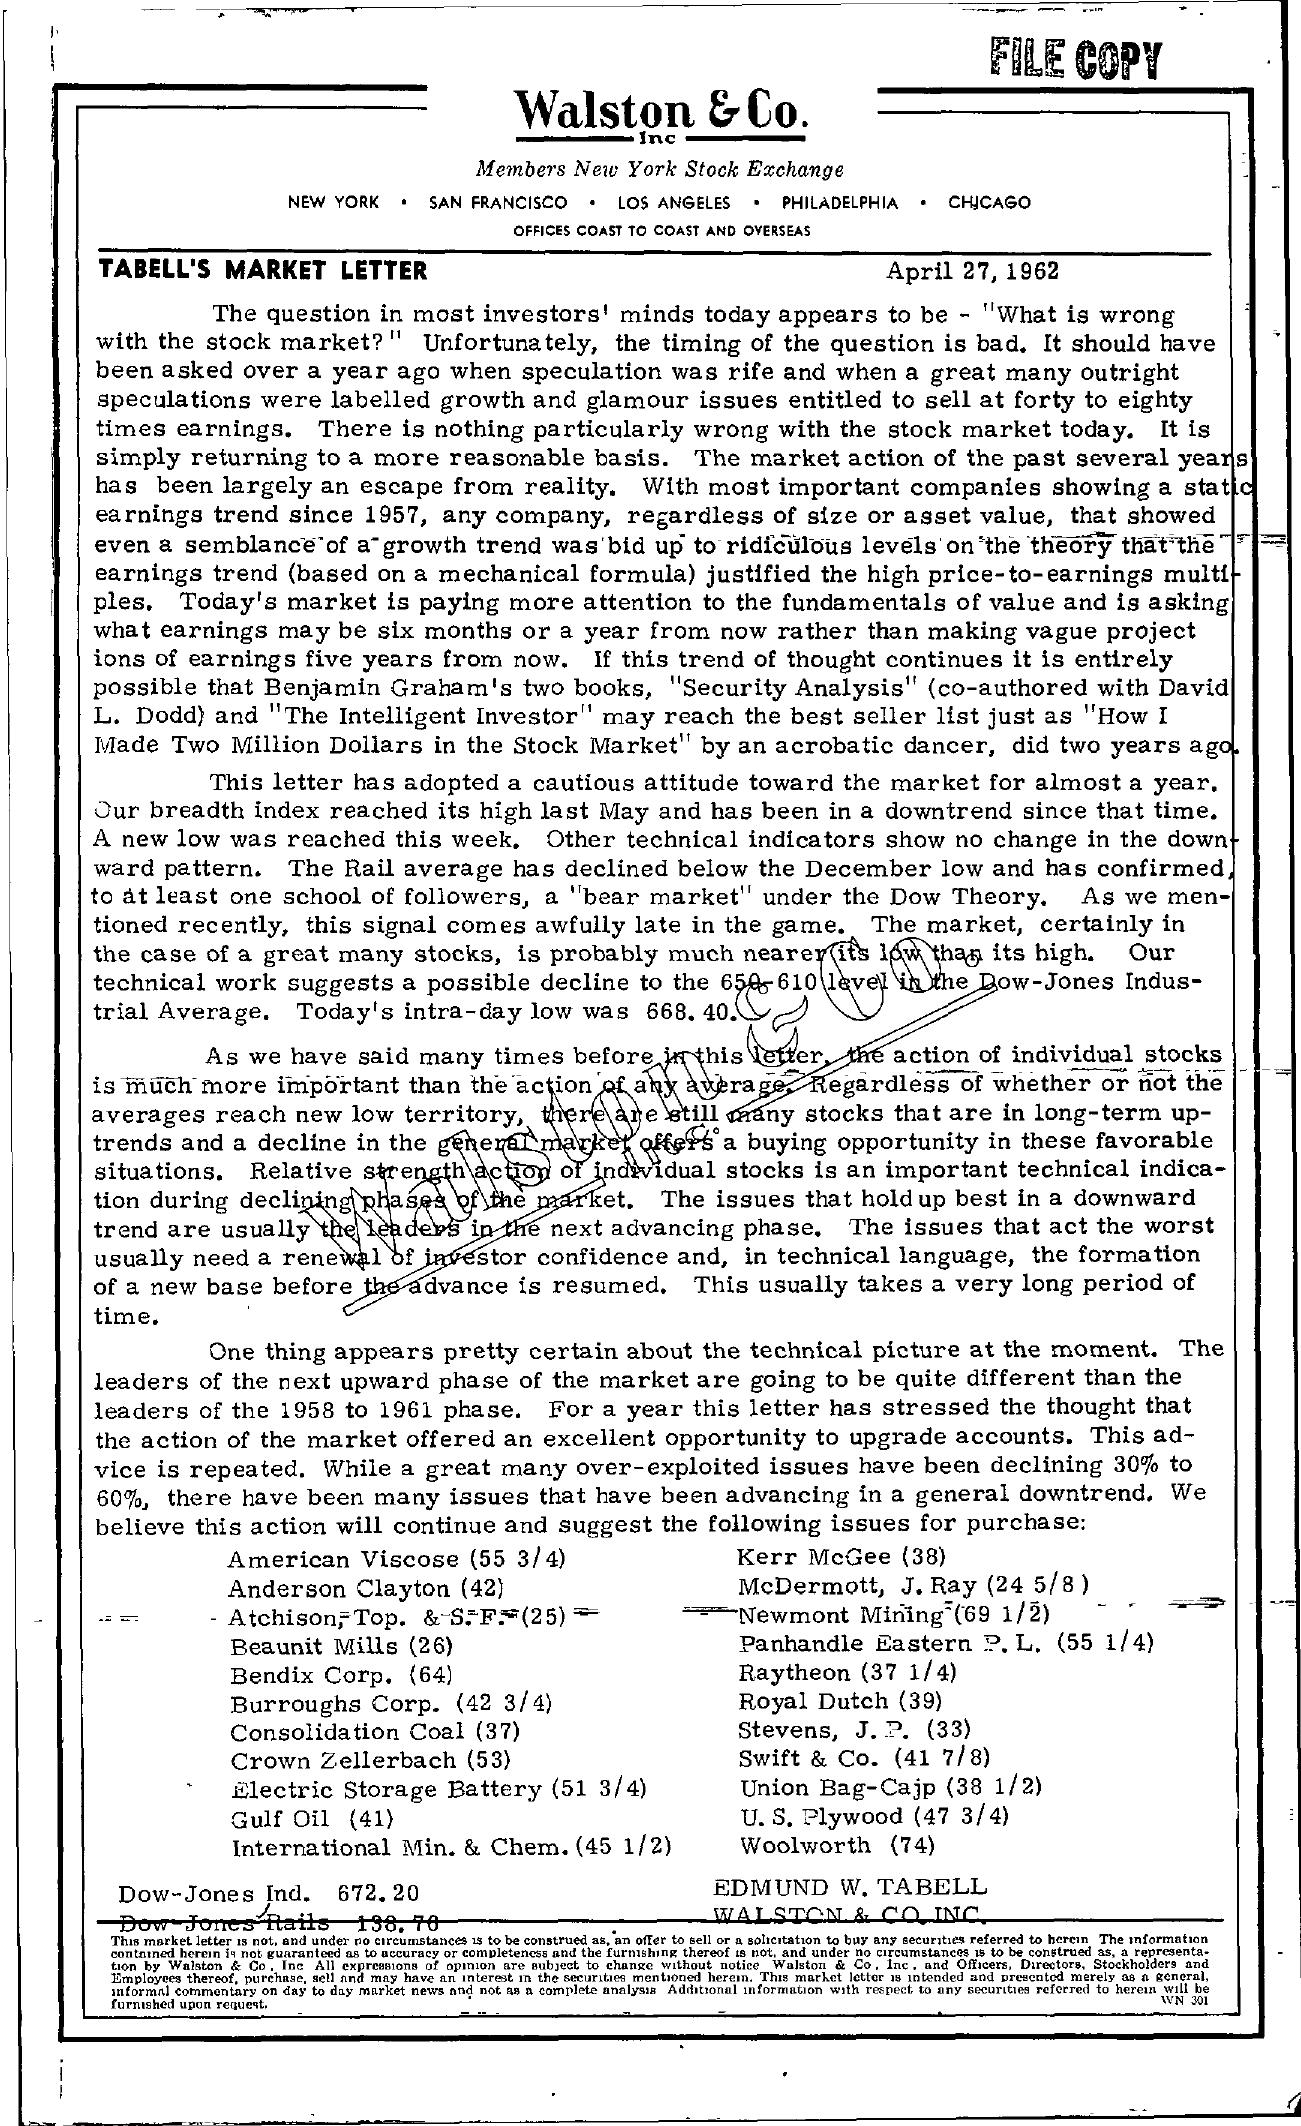 Tabell's Market Letter - April 27, 1962